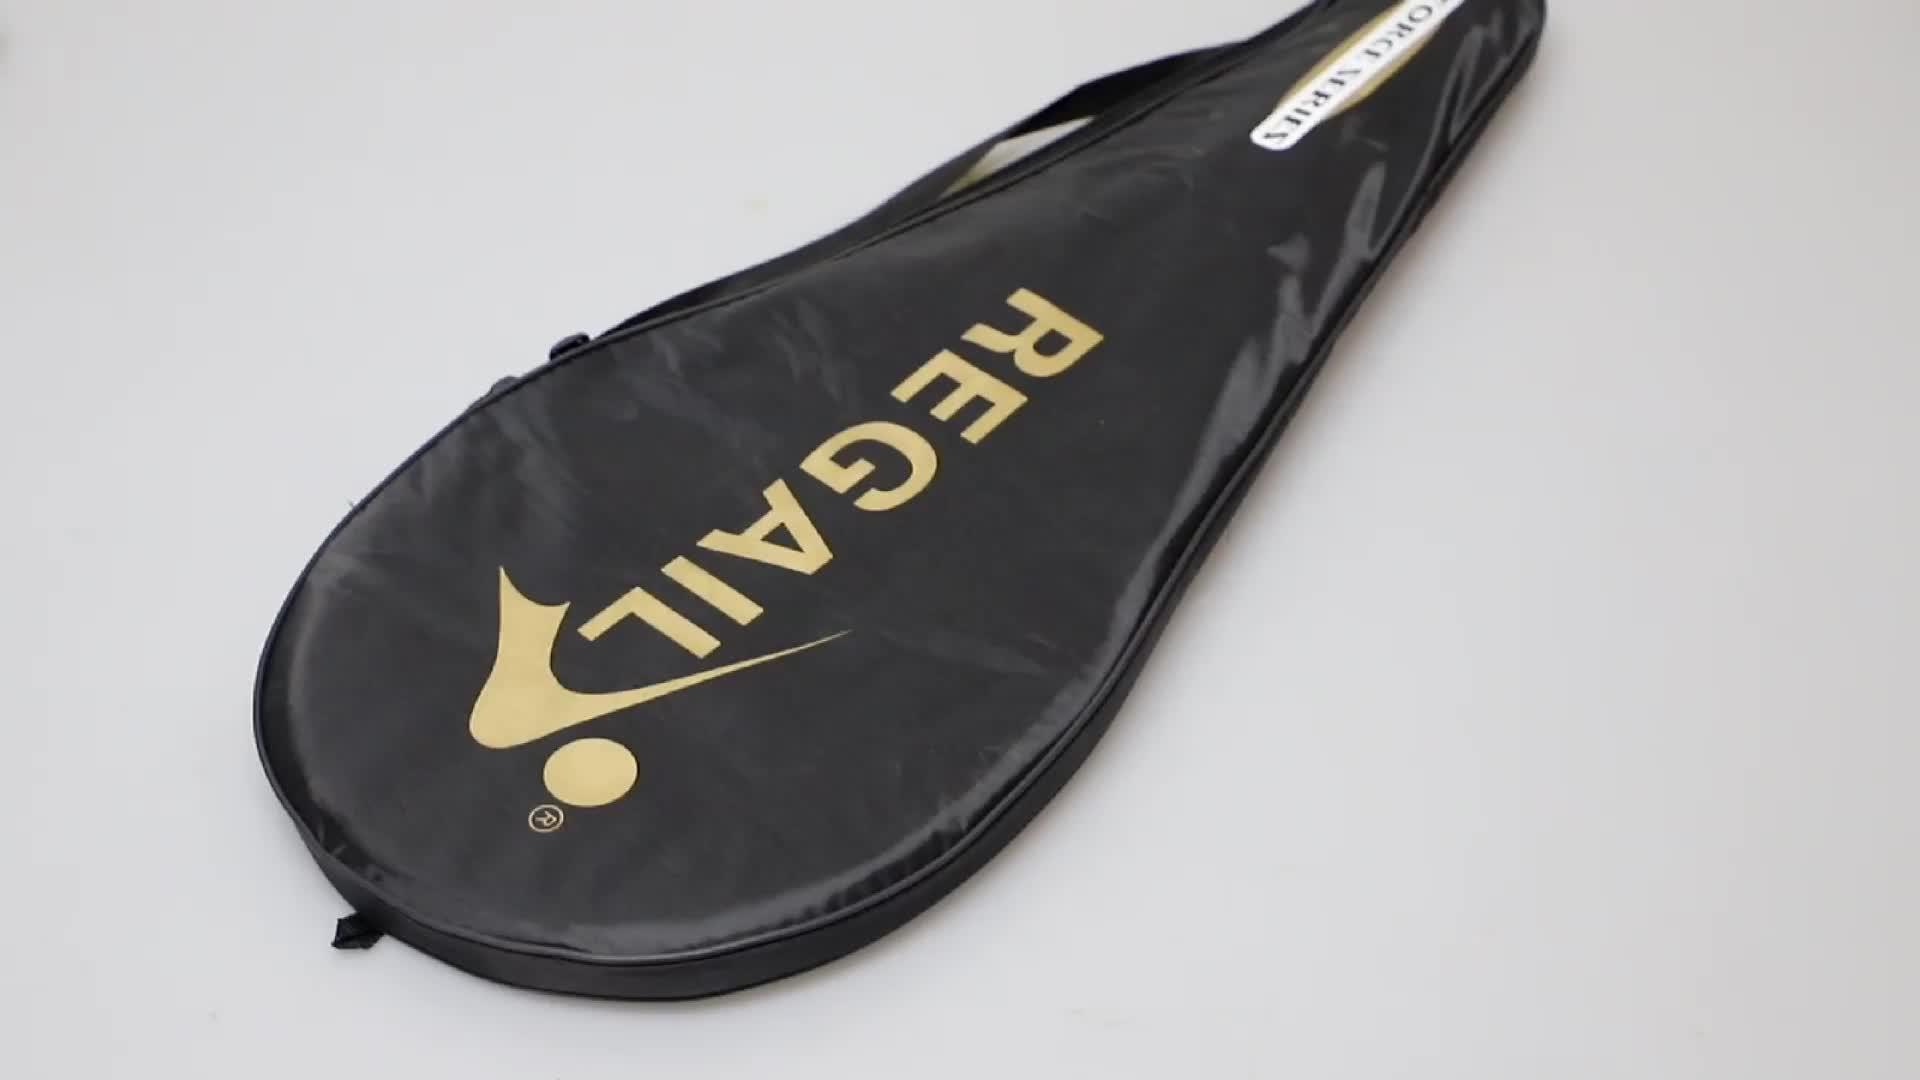 Raket Tenis Profesional Bahan Aloi Karbon Aluminium Oem Desain Raket Anda Sendiri Raqueta De Tennis Latihan Dewasa Remaja